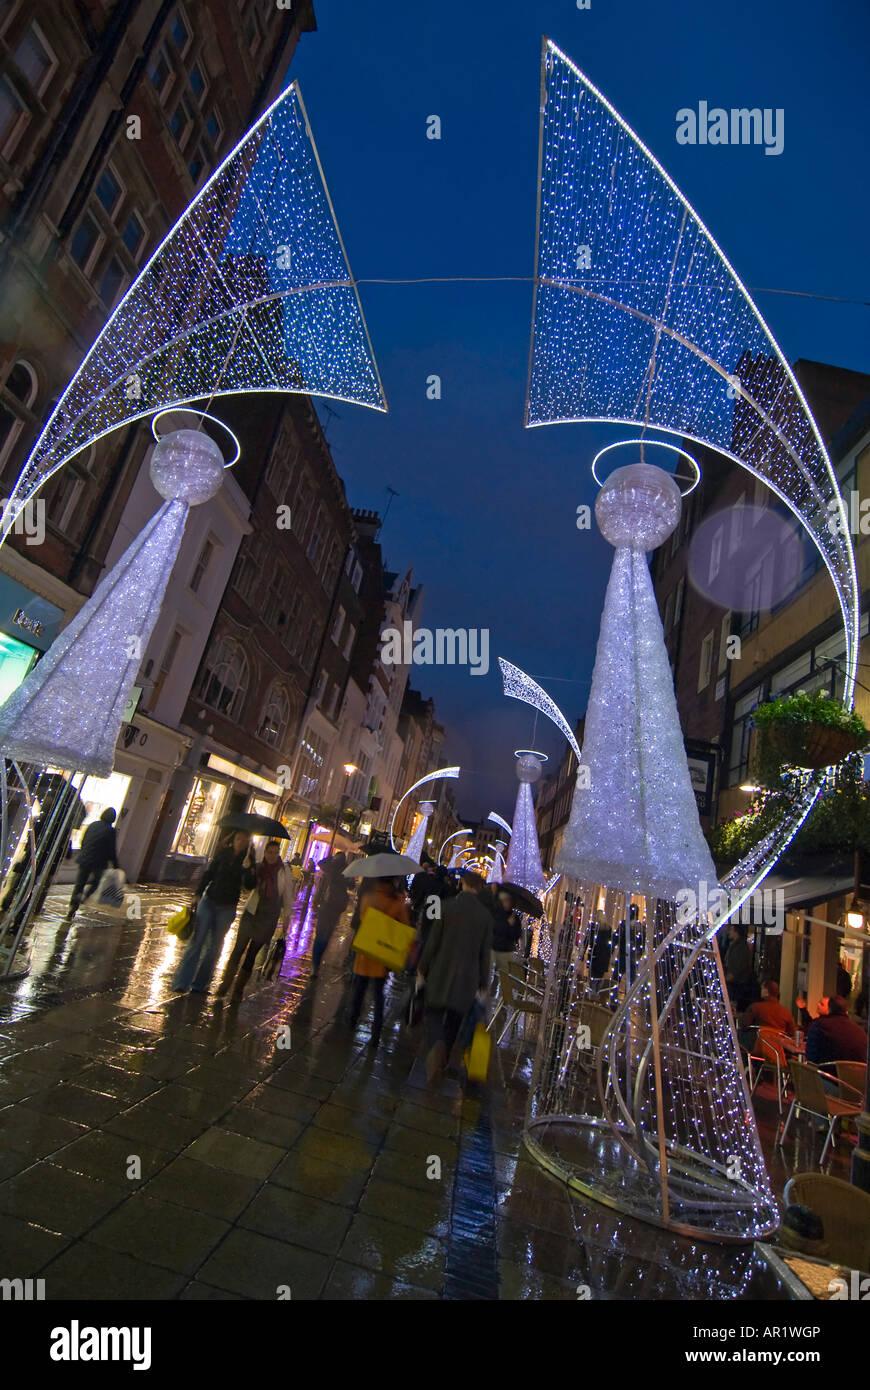 Weihnachtsbeleuchtung Engel.Vertikale Weitwinkel Von Abstrakten Weihnachtsbeleuchtung Engel Und